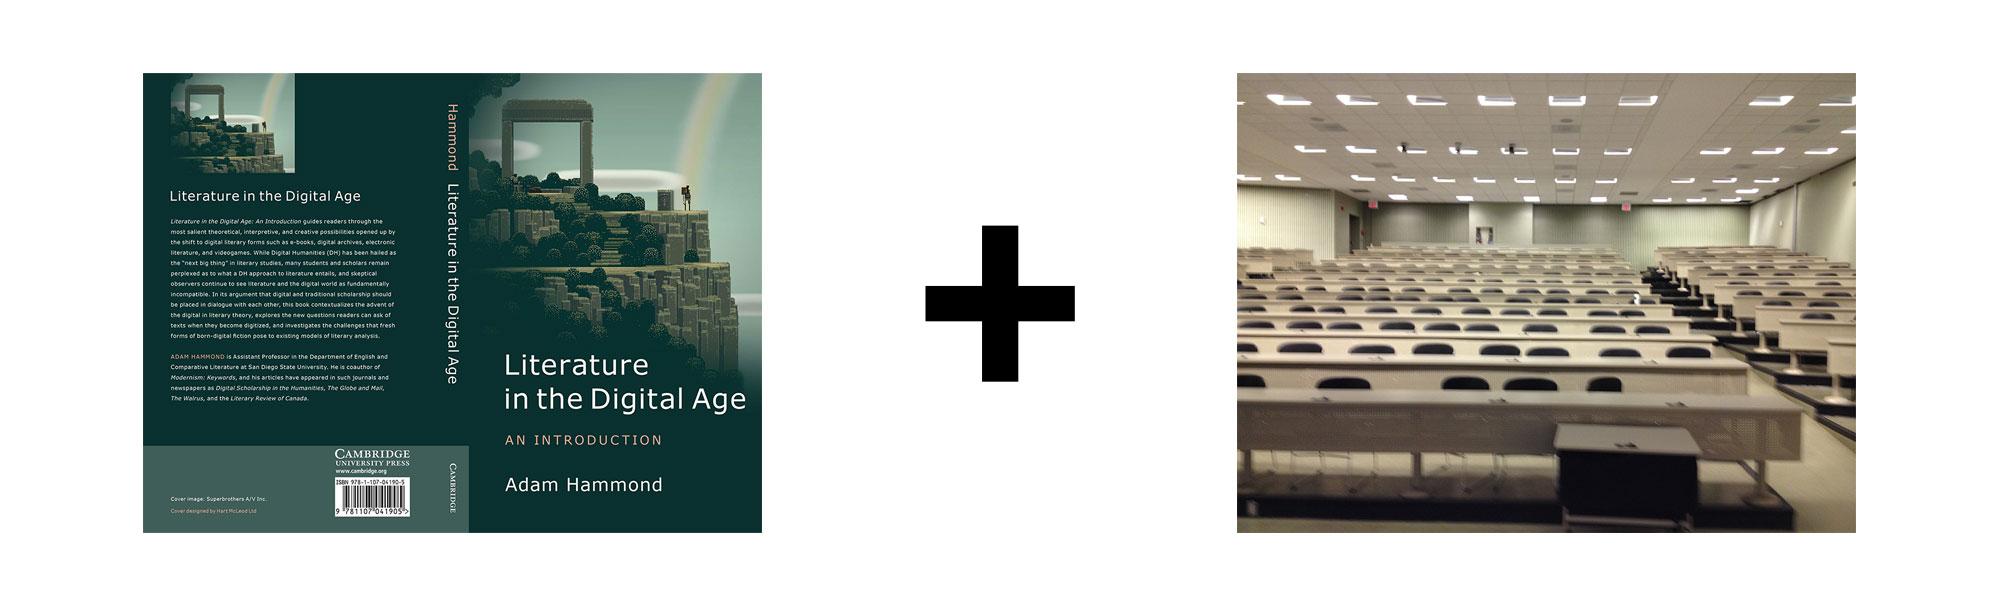 Teaching with <em>Literature in the Digital Age</em>